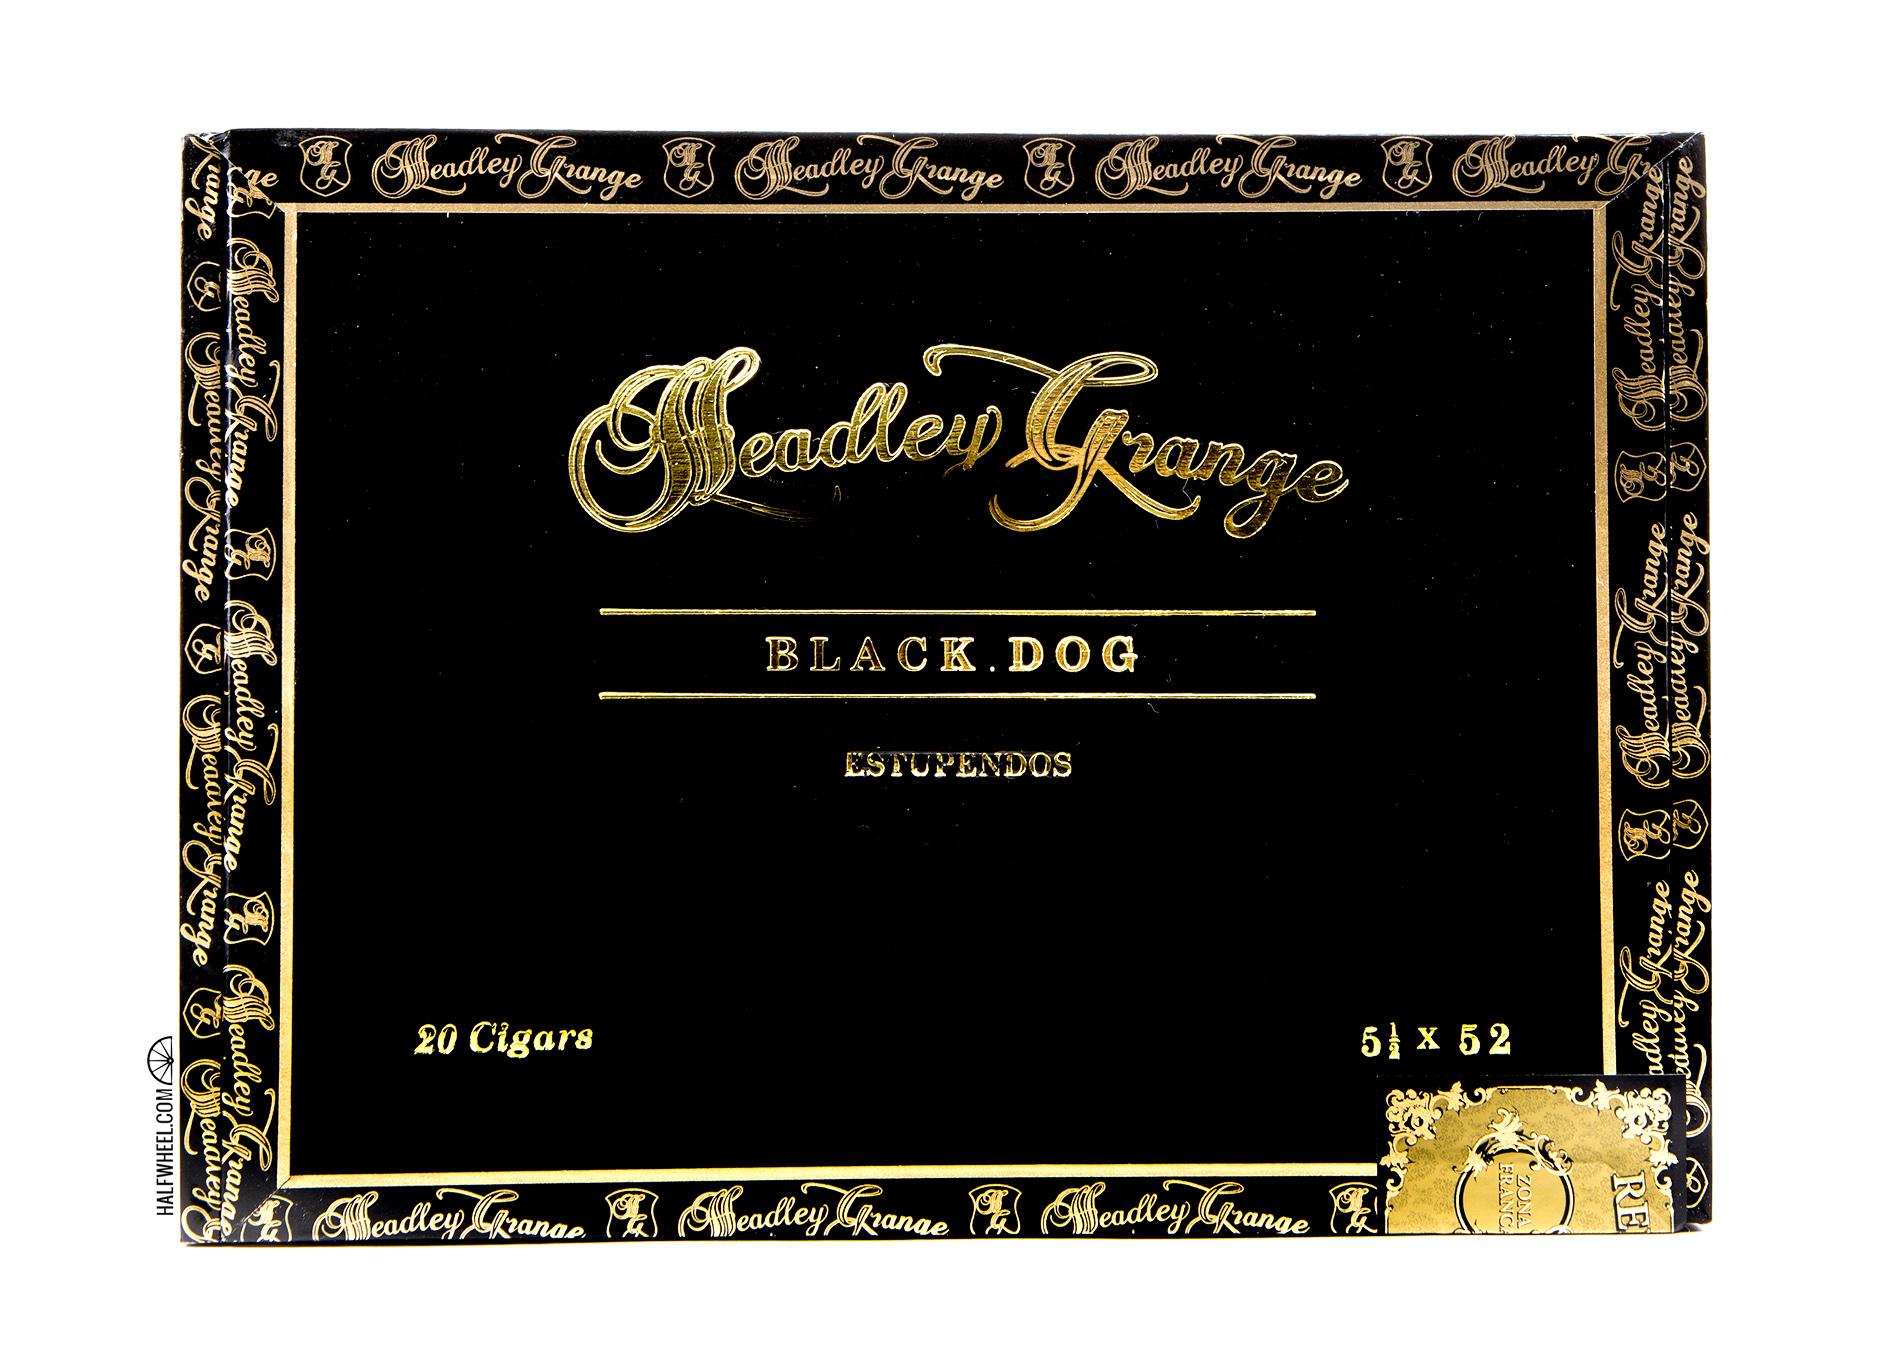 Headley Grange Black Dog Dobles Box 1